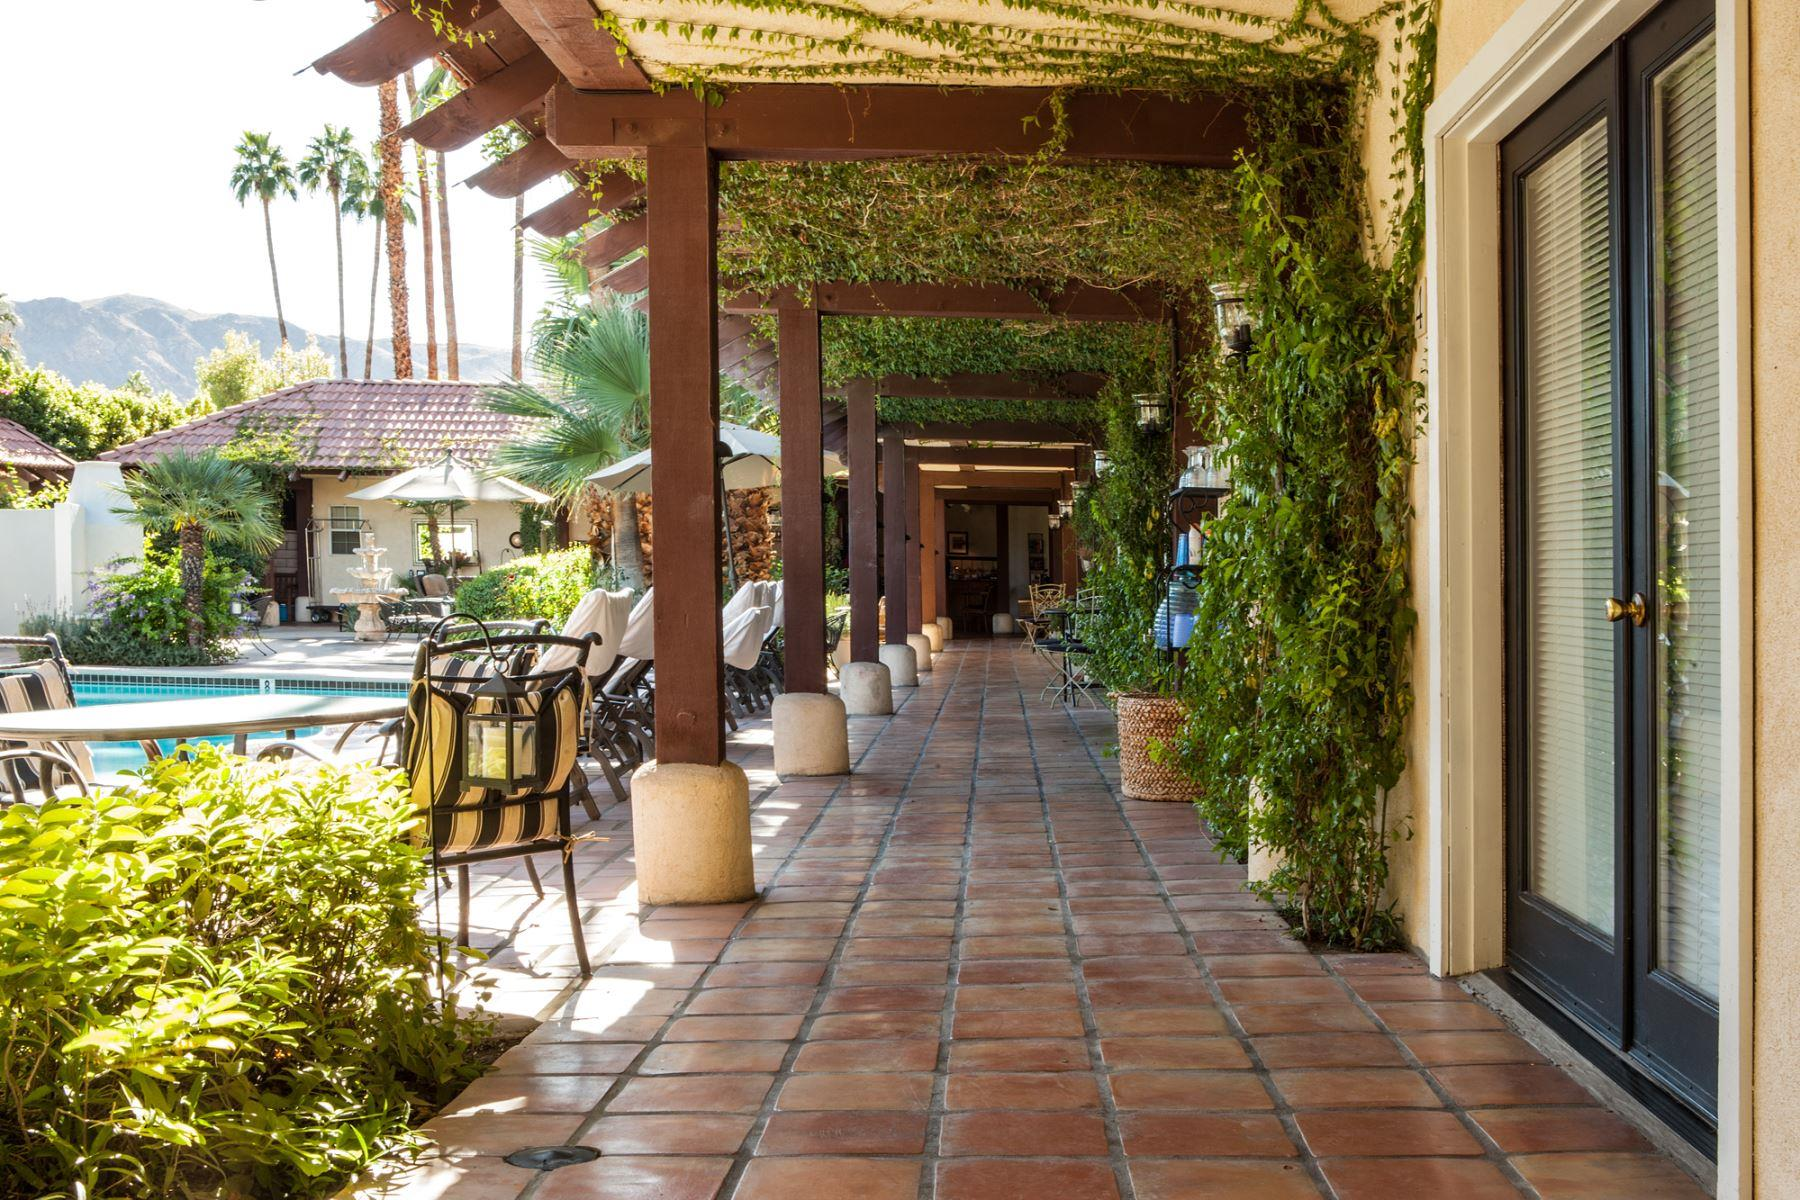 La Maison courtyard